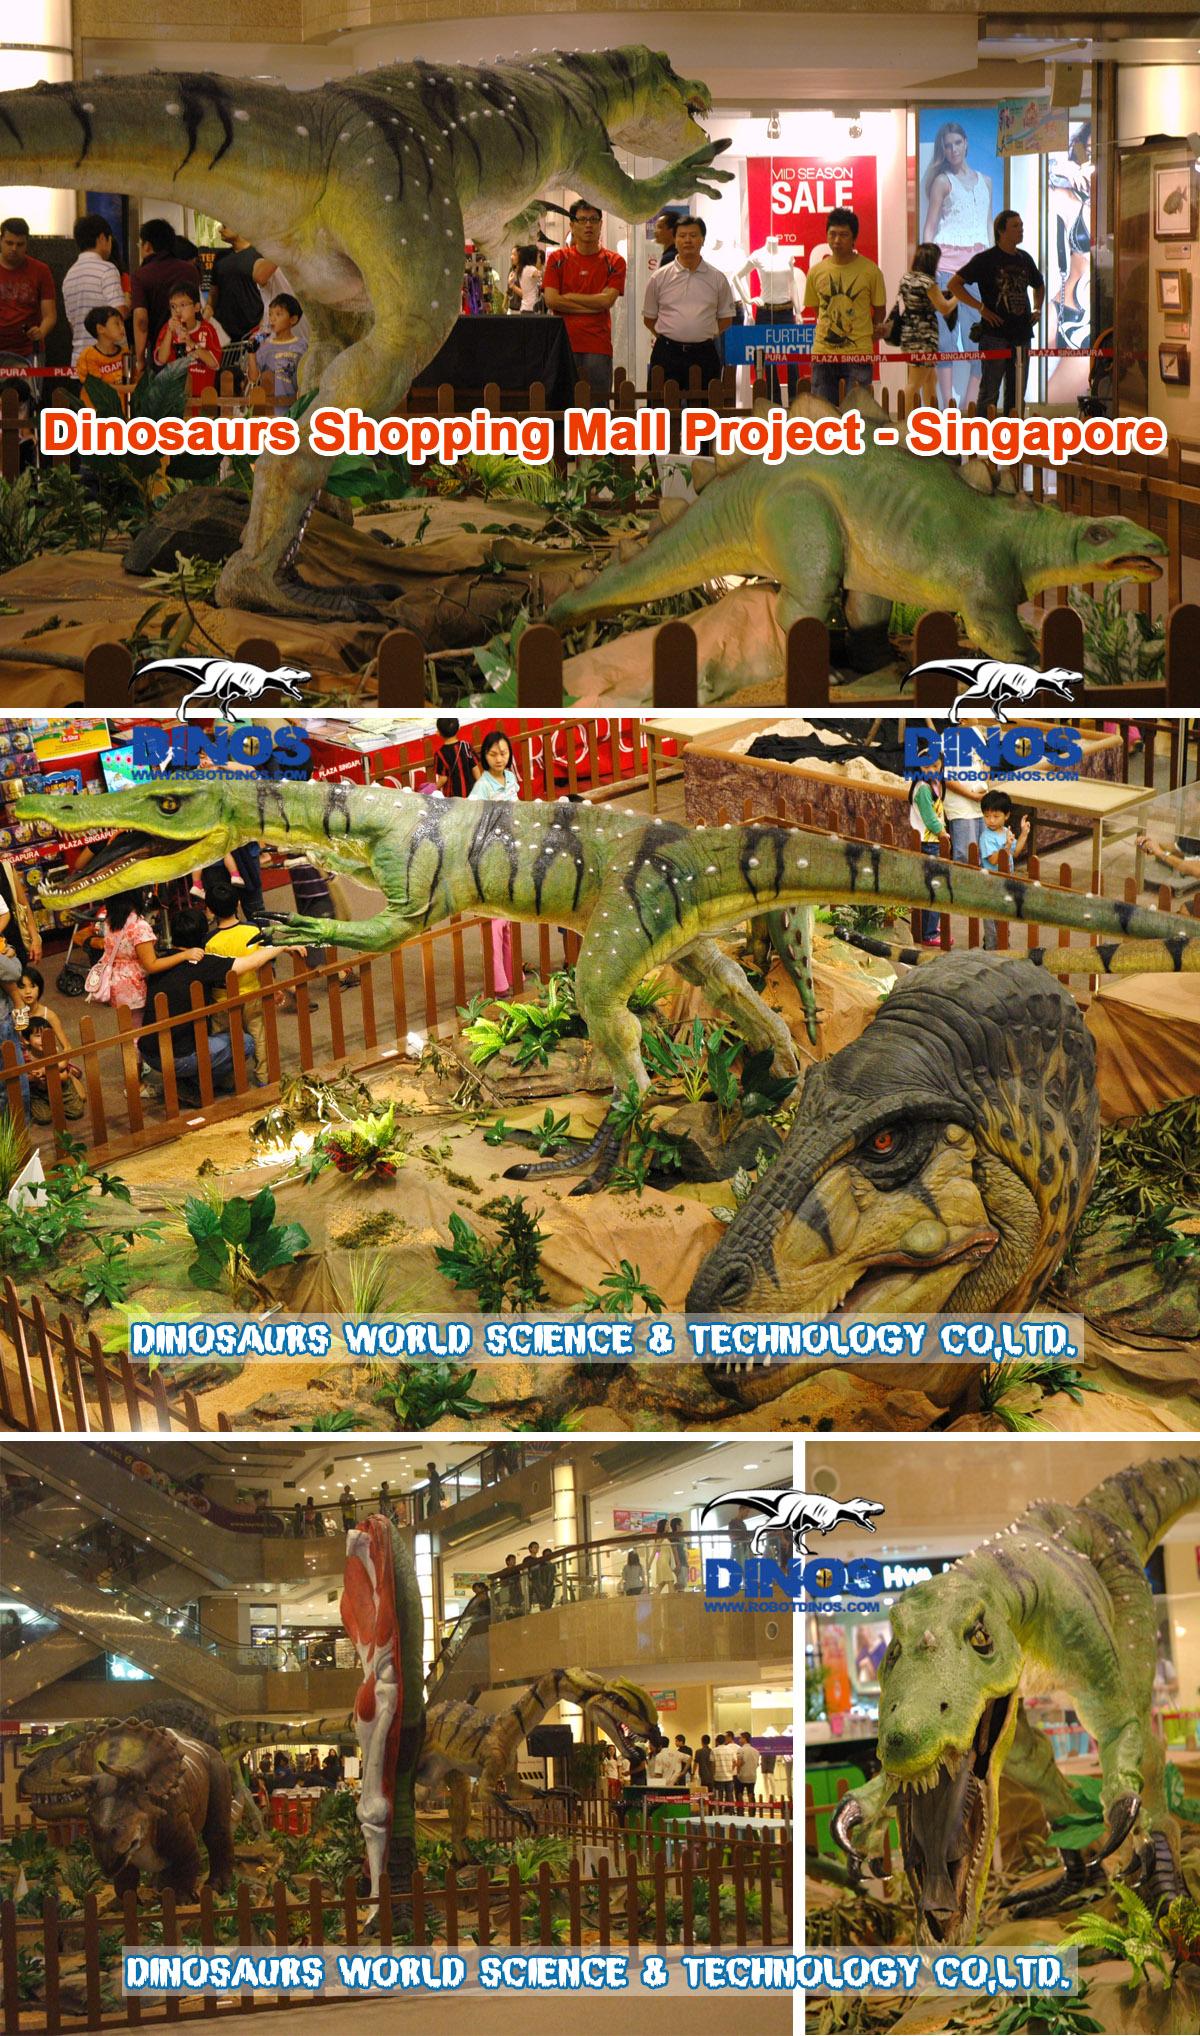 dinosaur costume,fiberglass dinosaurs,fiberglass dinosaur,resin dinosaurs,animatronic dinosaur